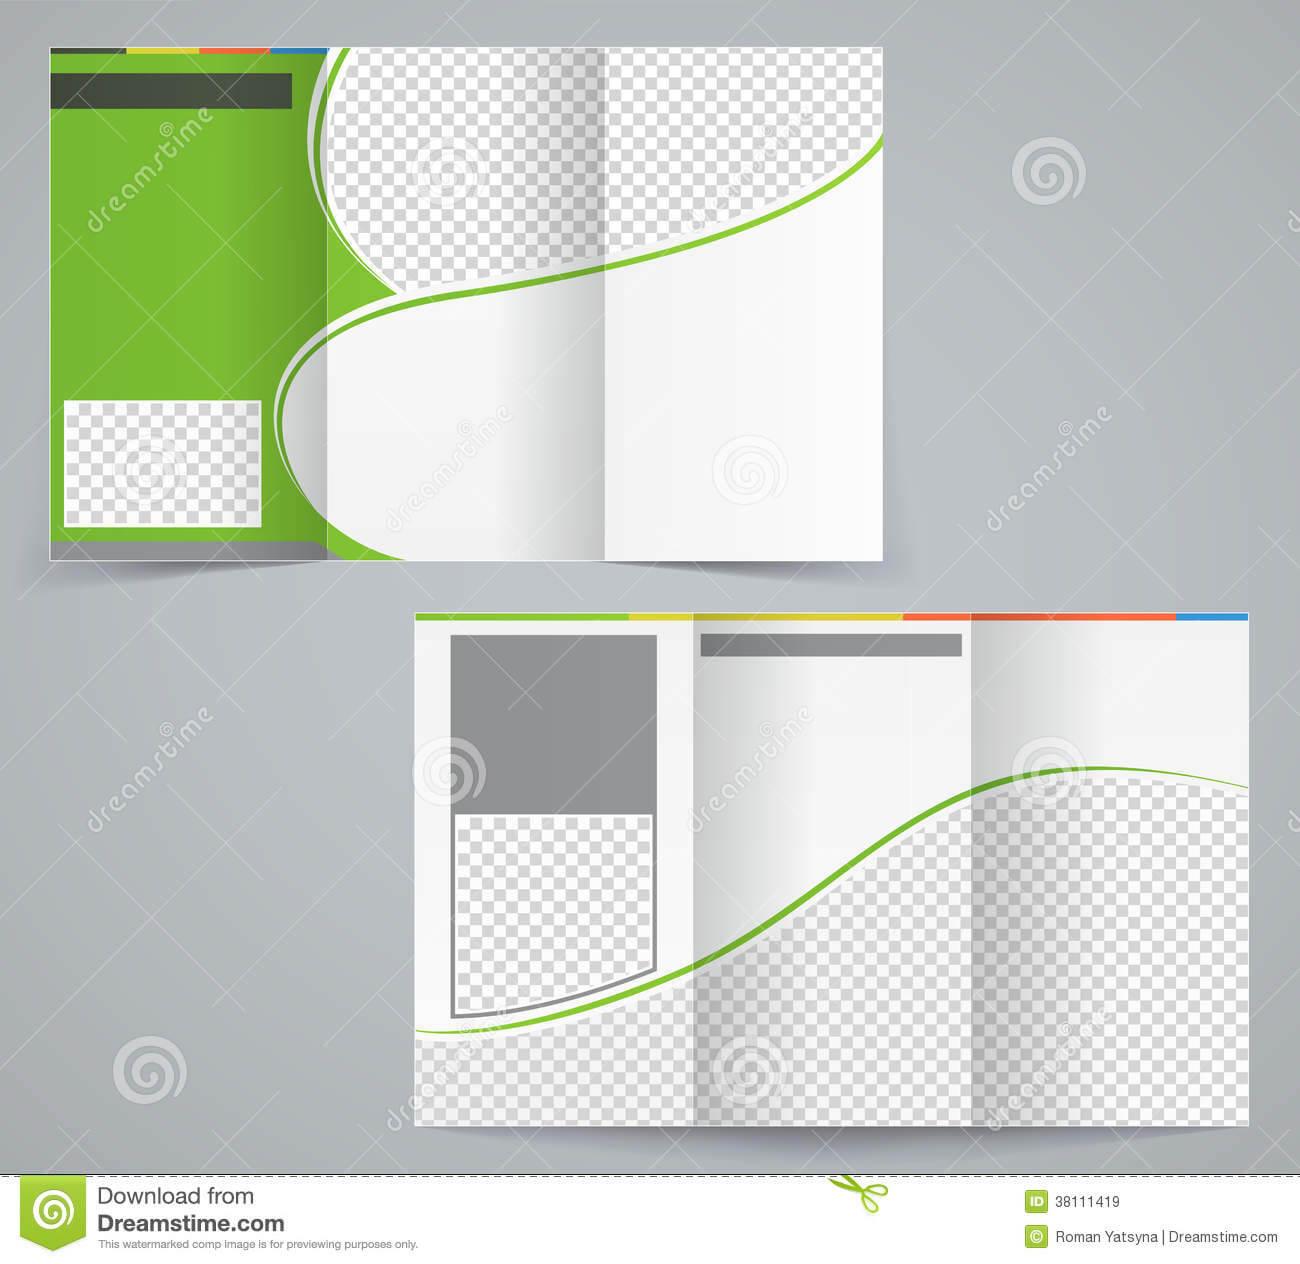 Tri-Fold Business Brochure Template, Vector Green Stock inside Illustrator Brochure Templates Free Download